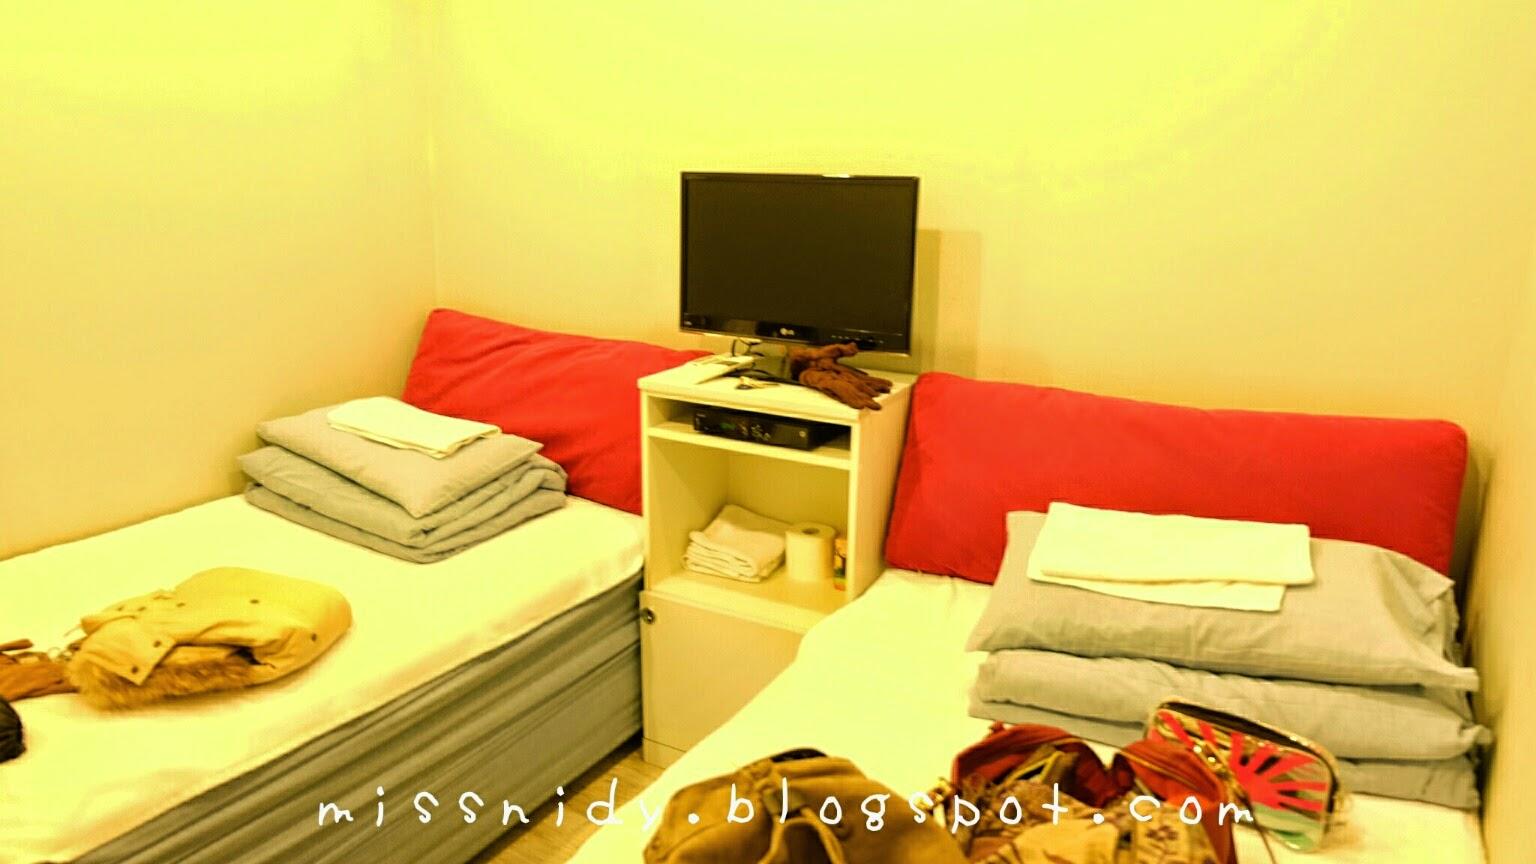 menginap di the new day hostel busan